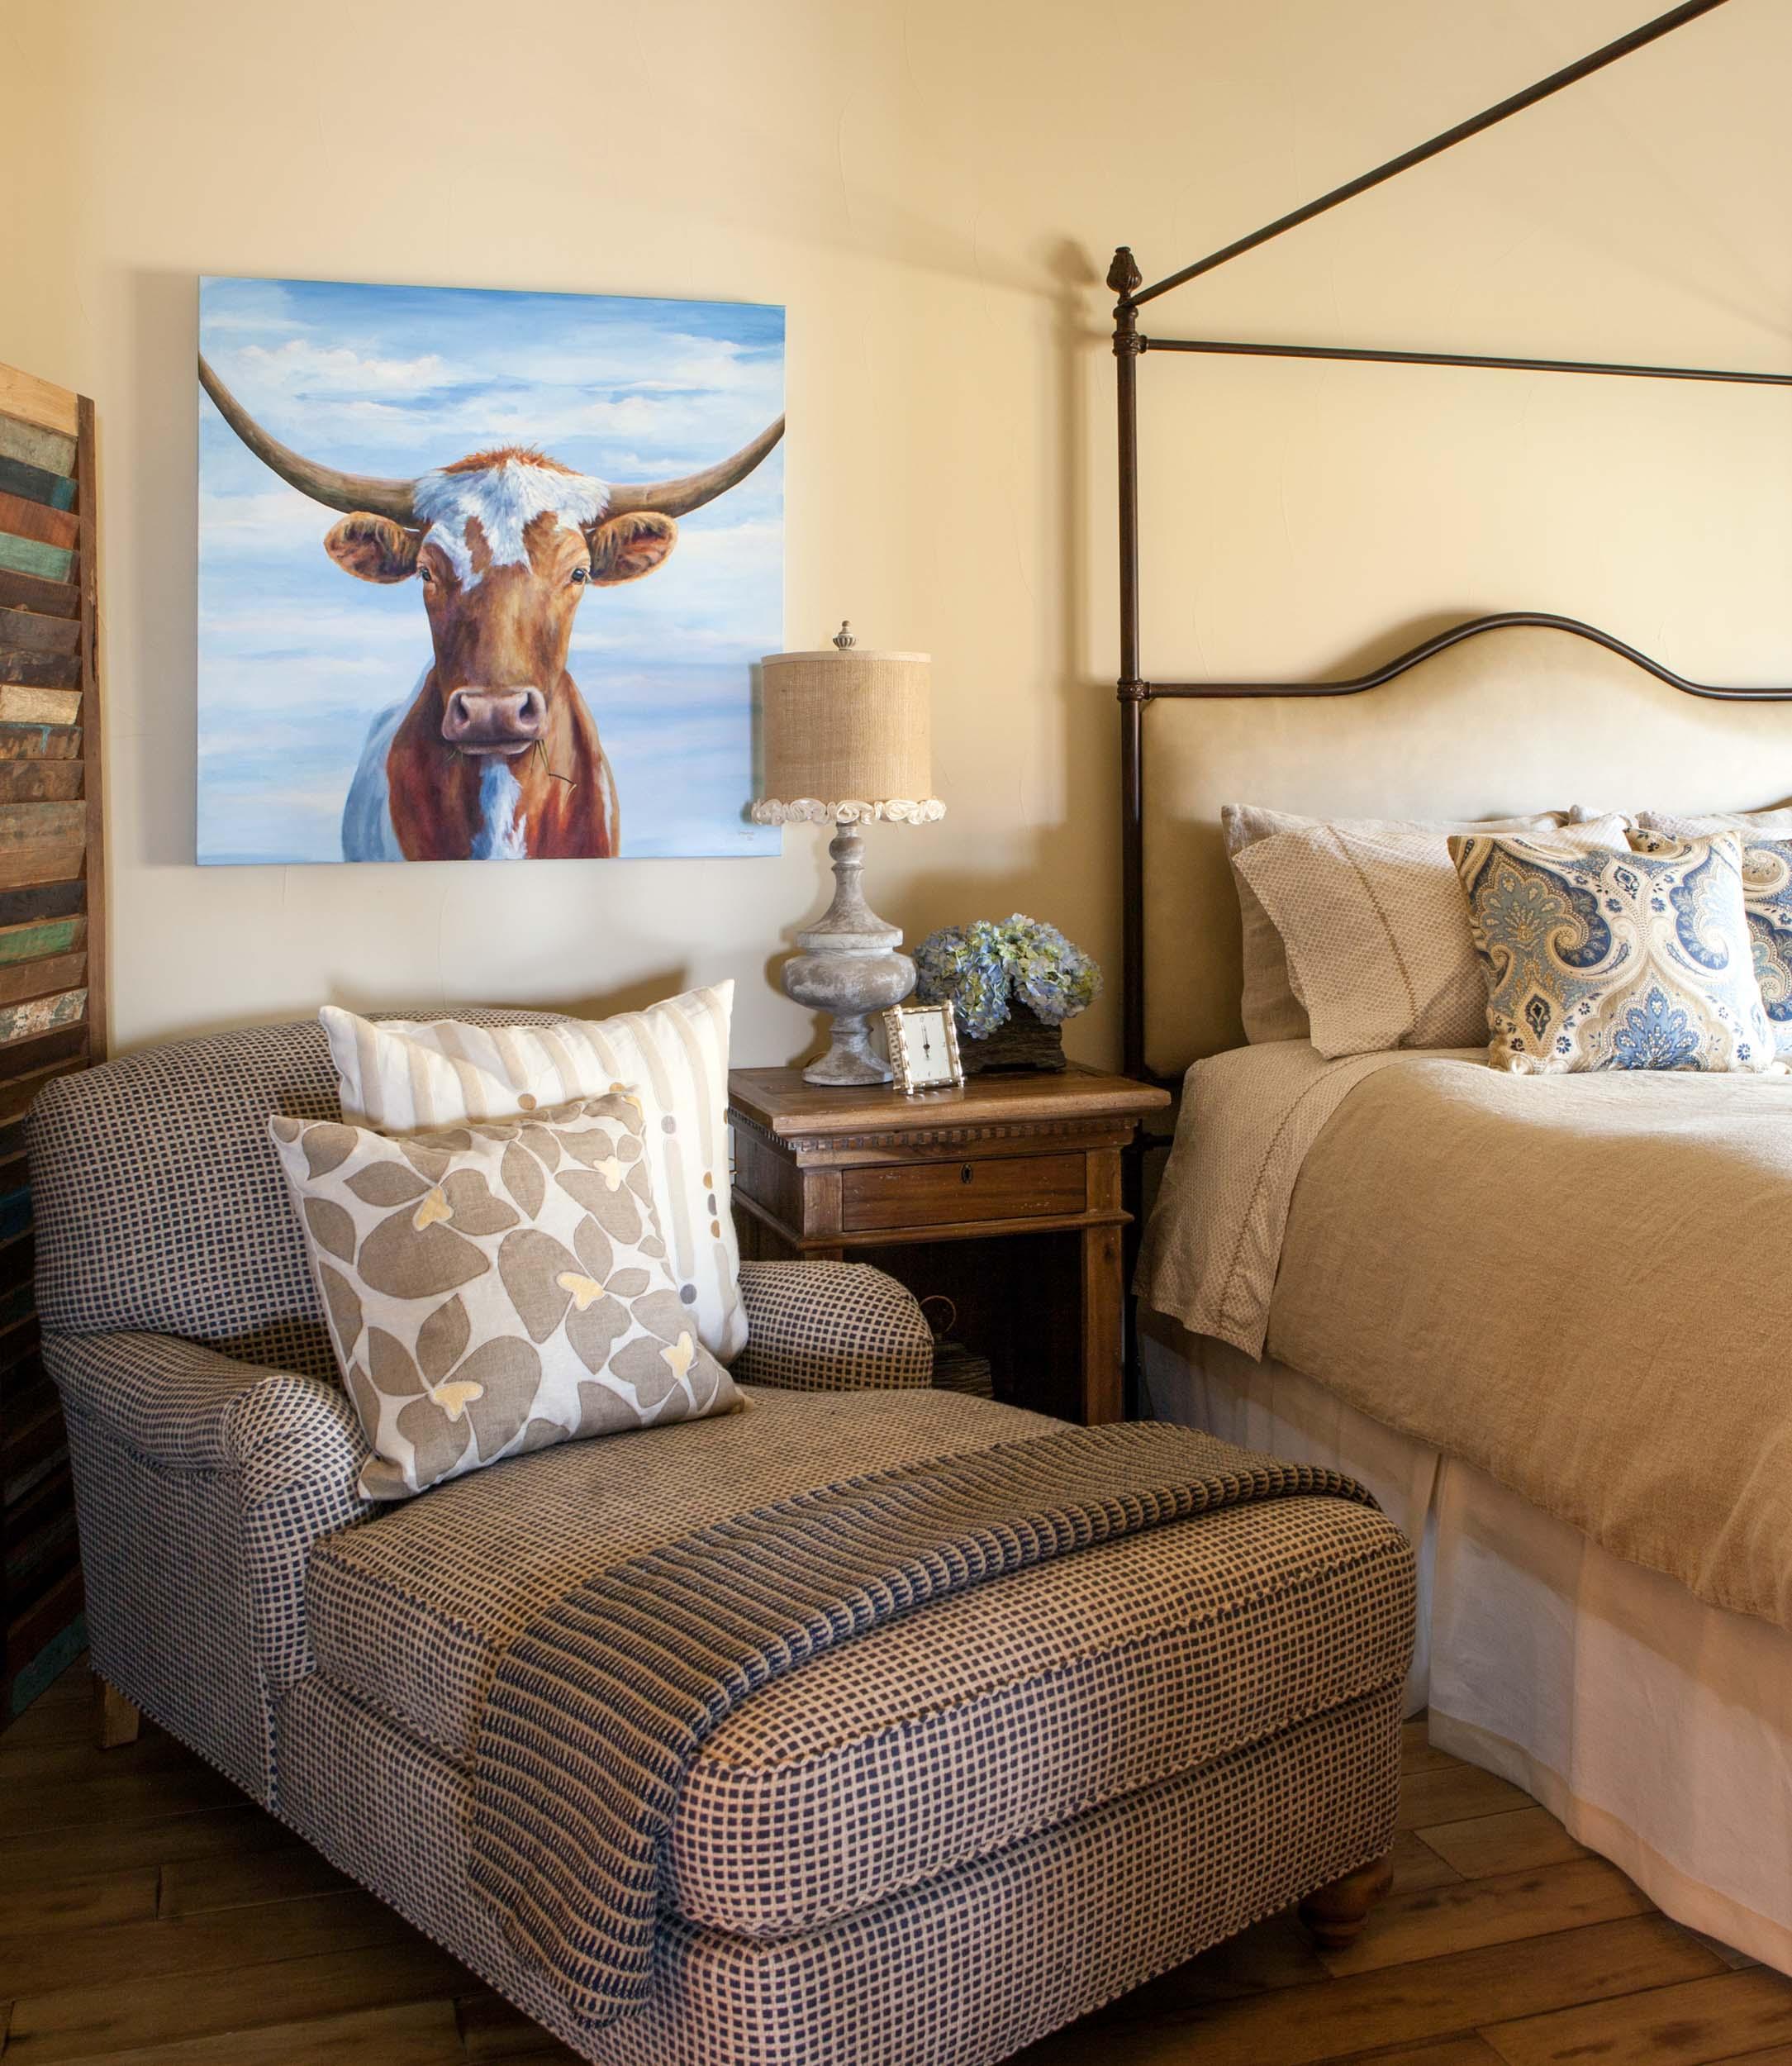 austin-house-guest-bedroom-2-interior-design.jpg